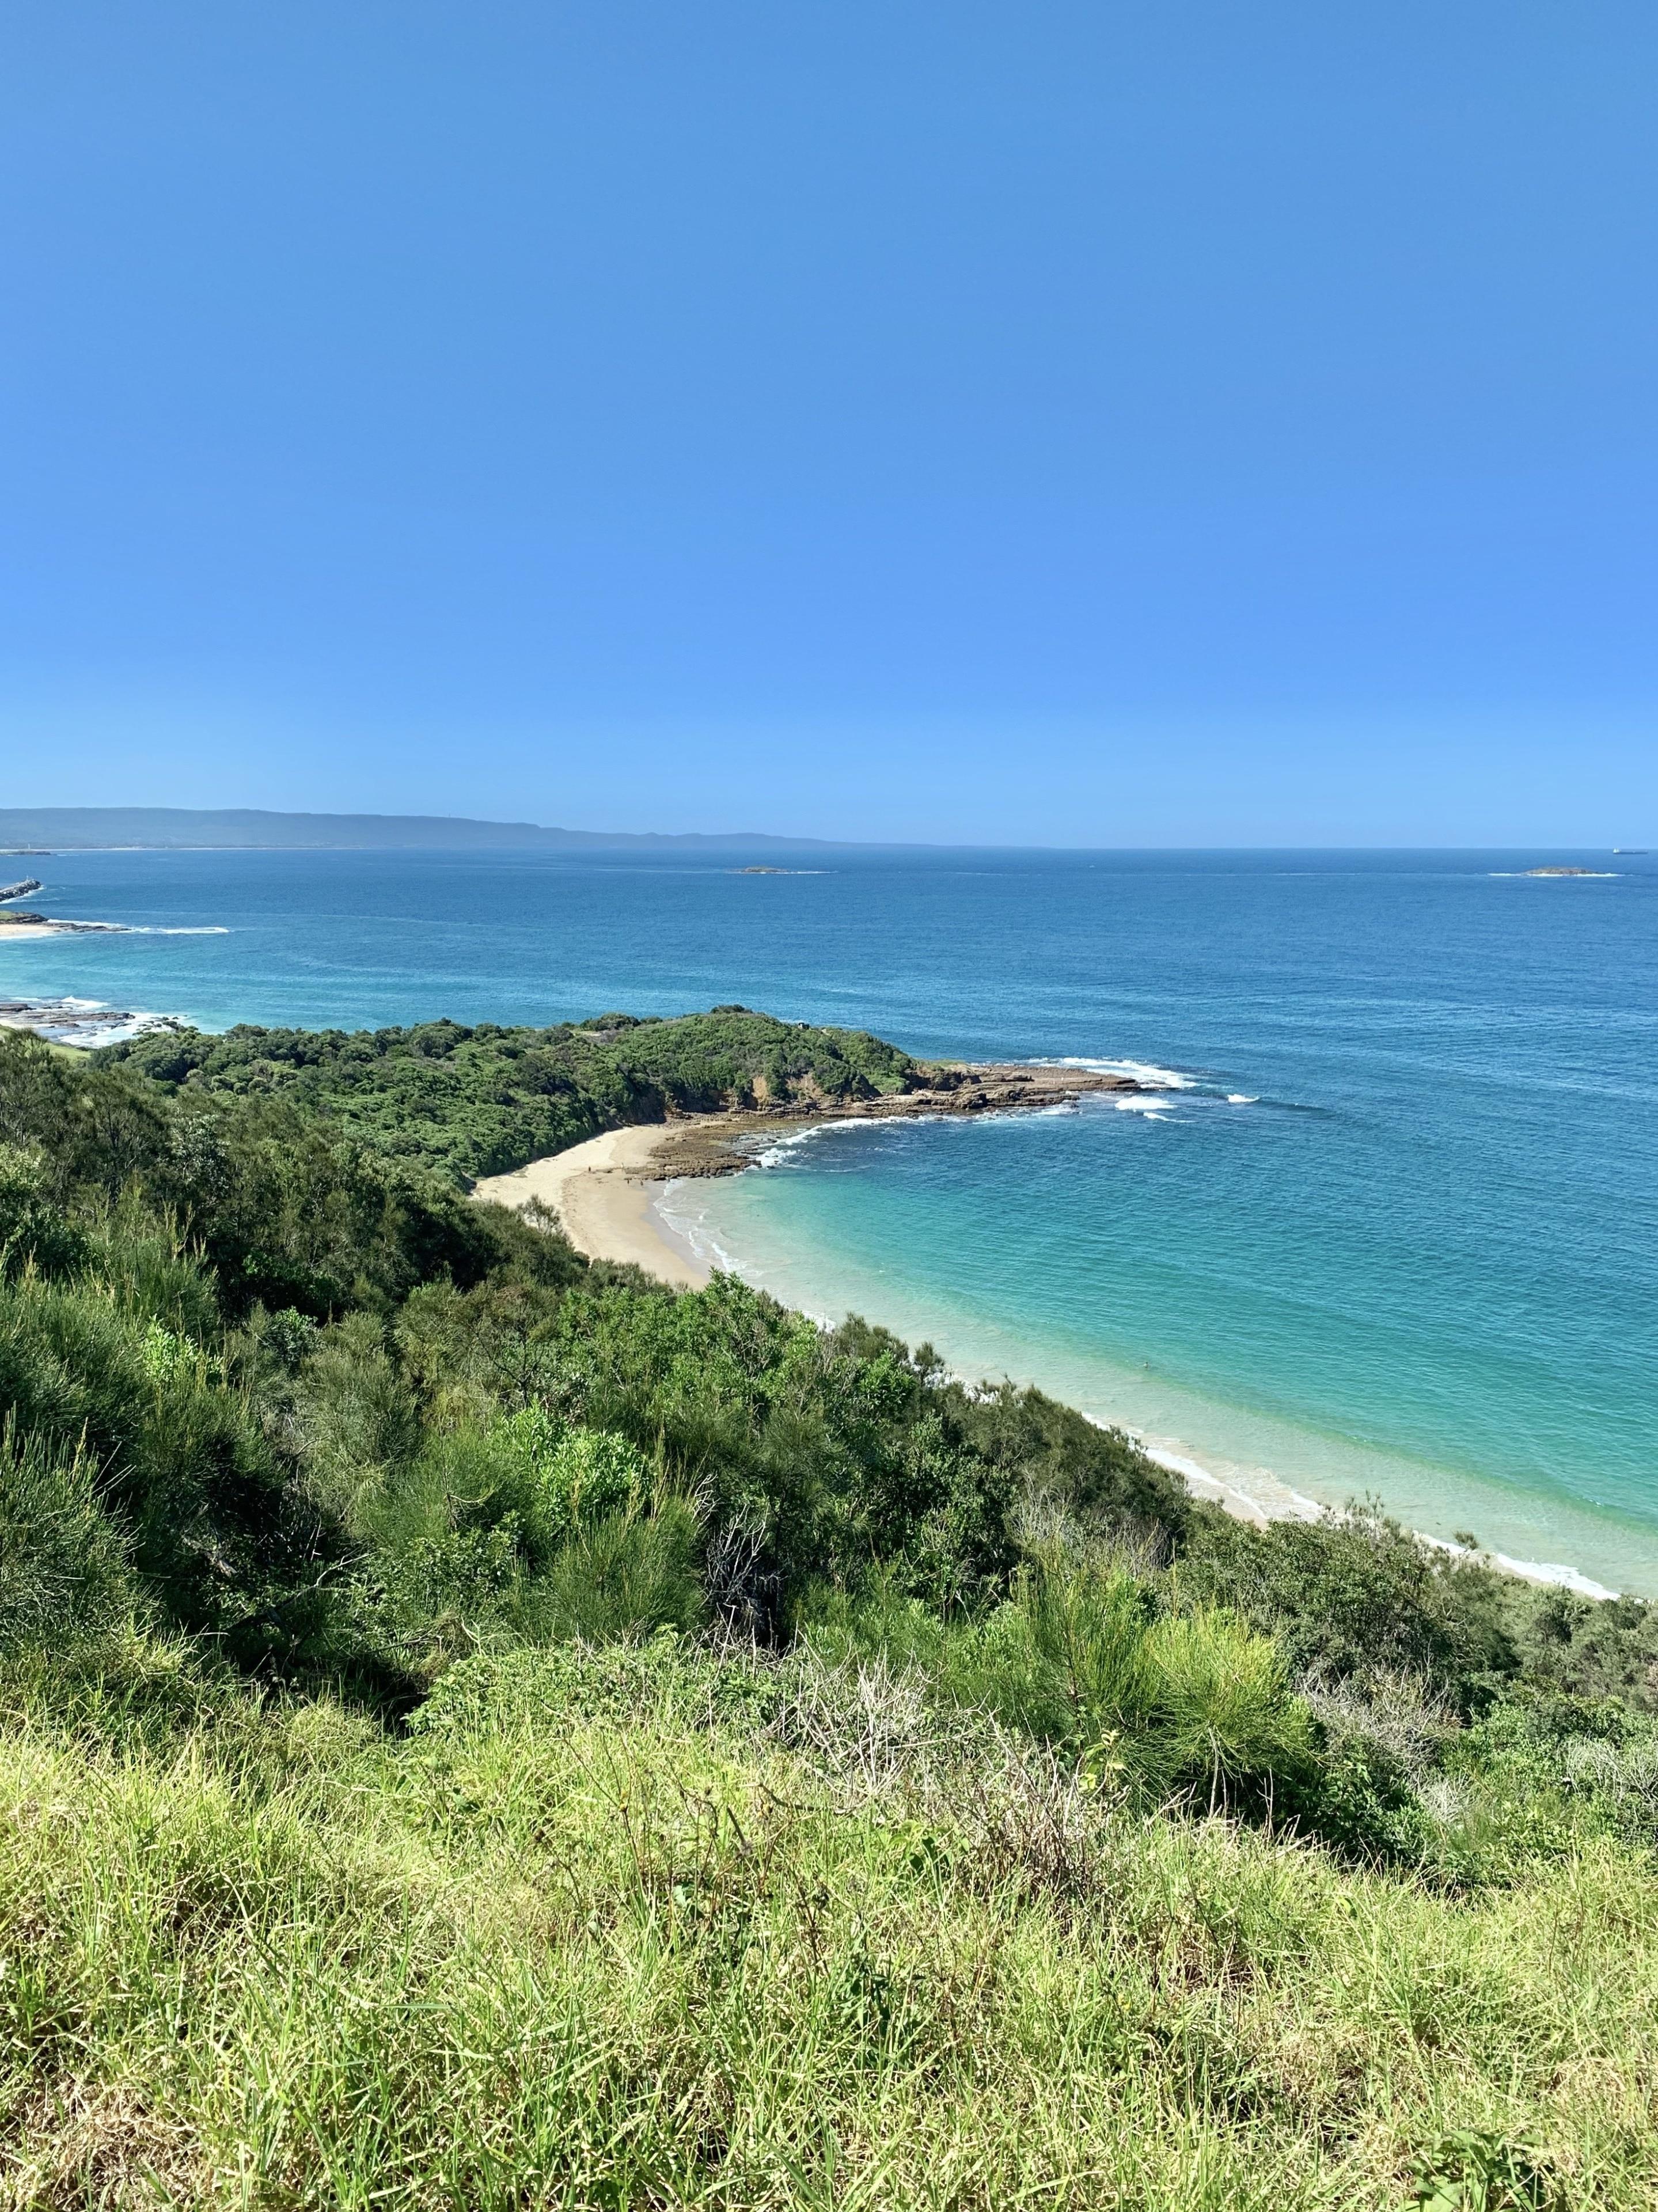 Port Kembla, Wollongong, New South Wales, Australia